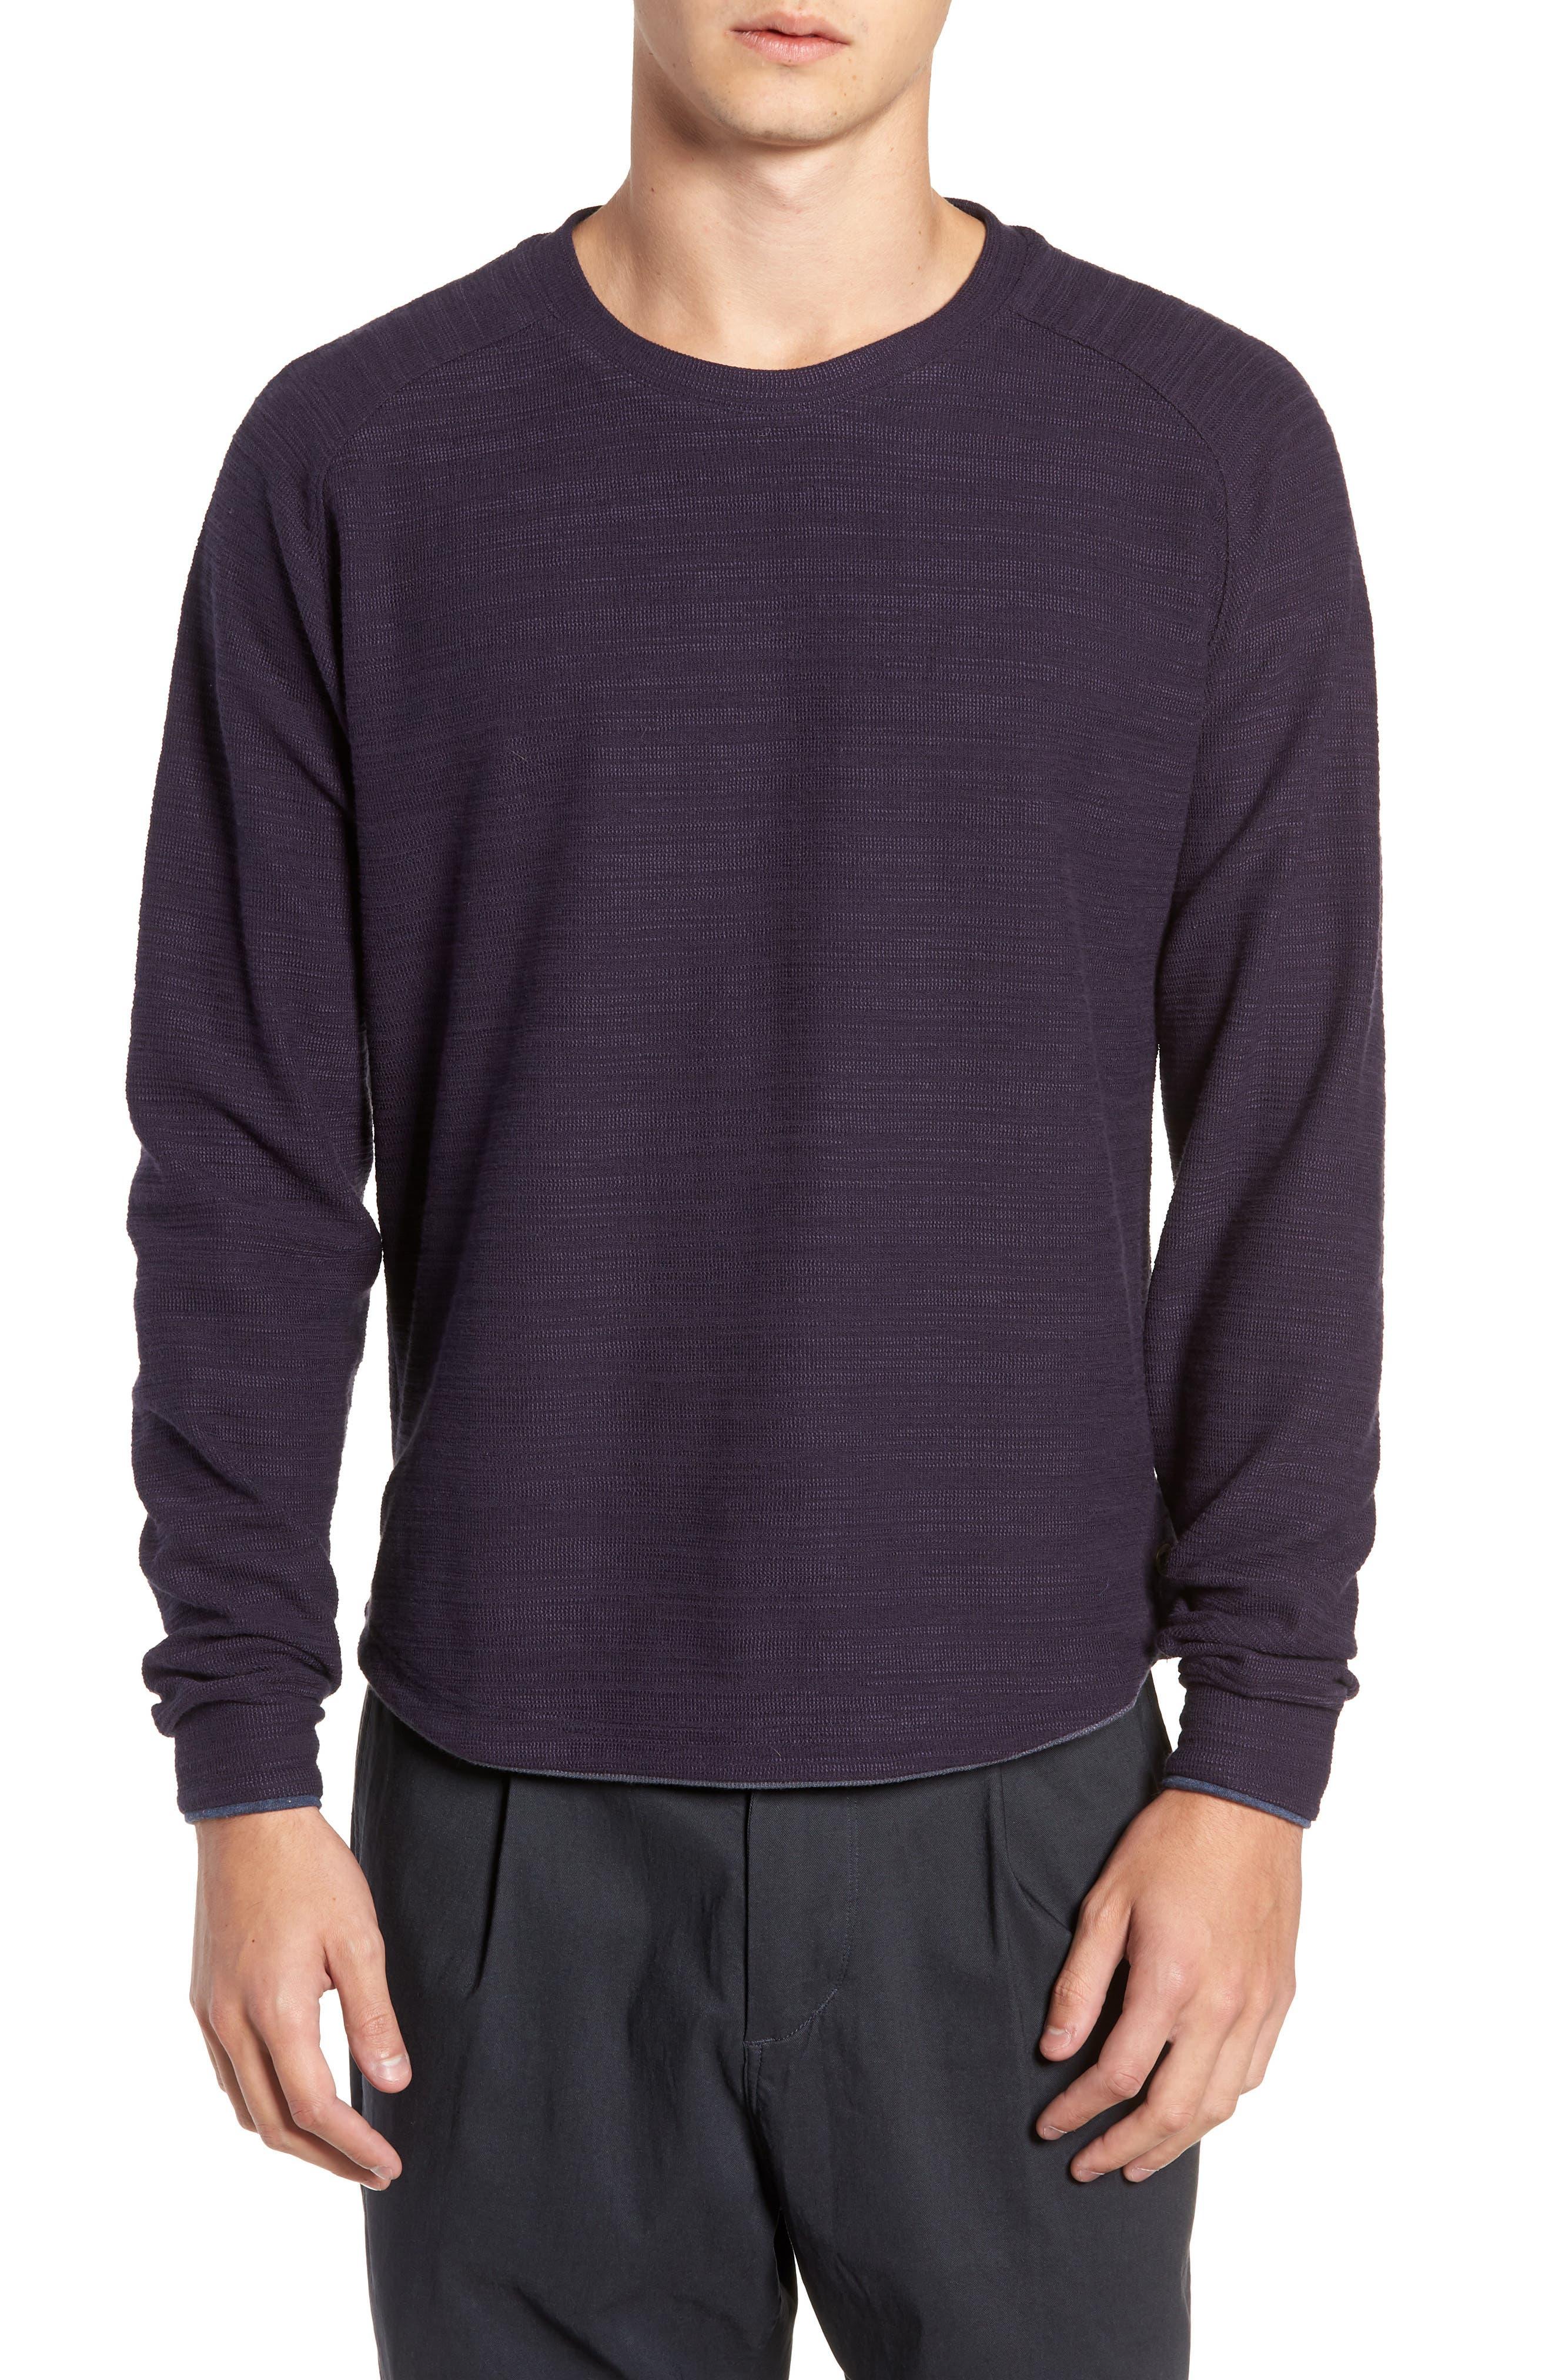 250 Loft Slubbed Crewneck Sweater,                             Main thumbnail 1, color,                             NAVY